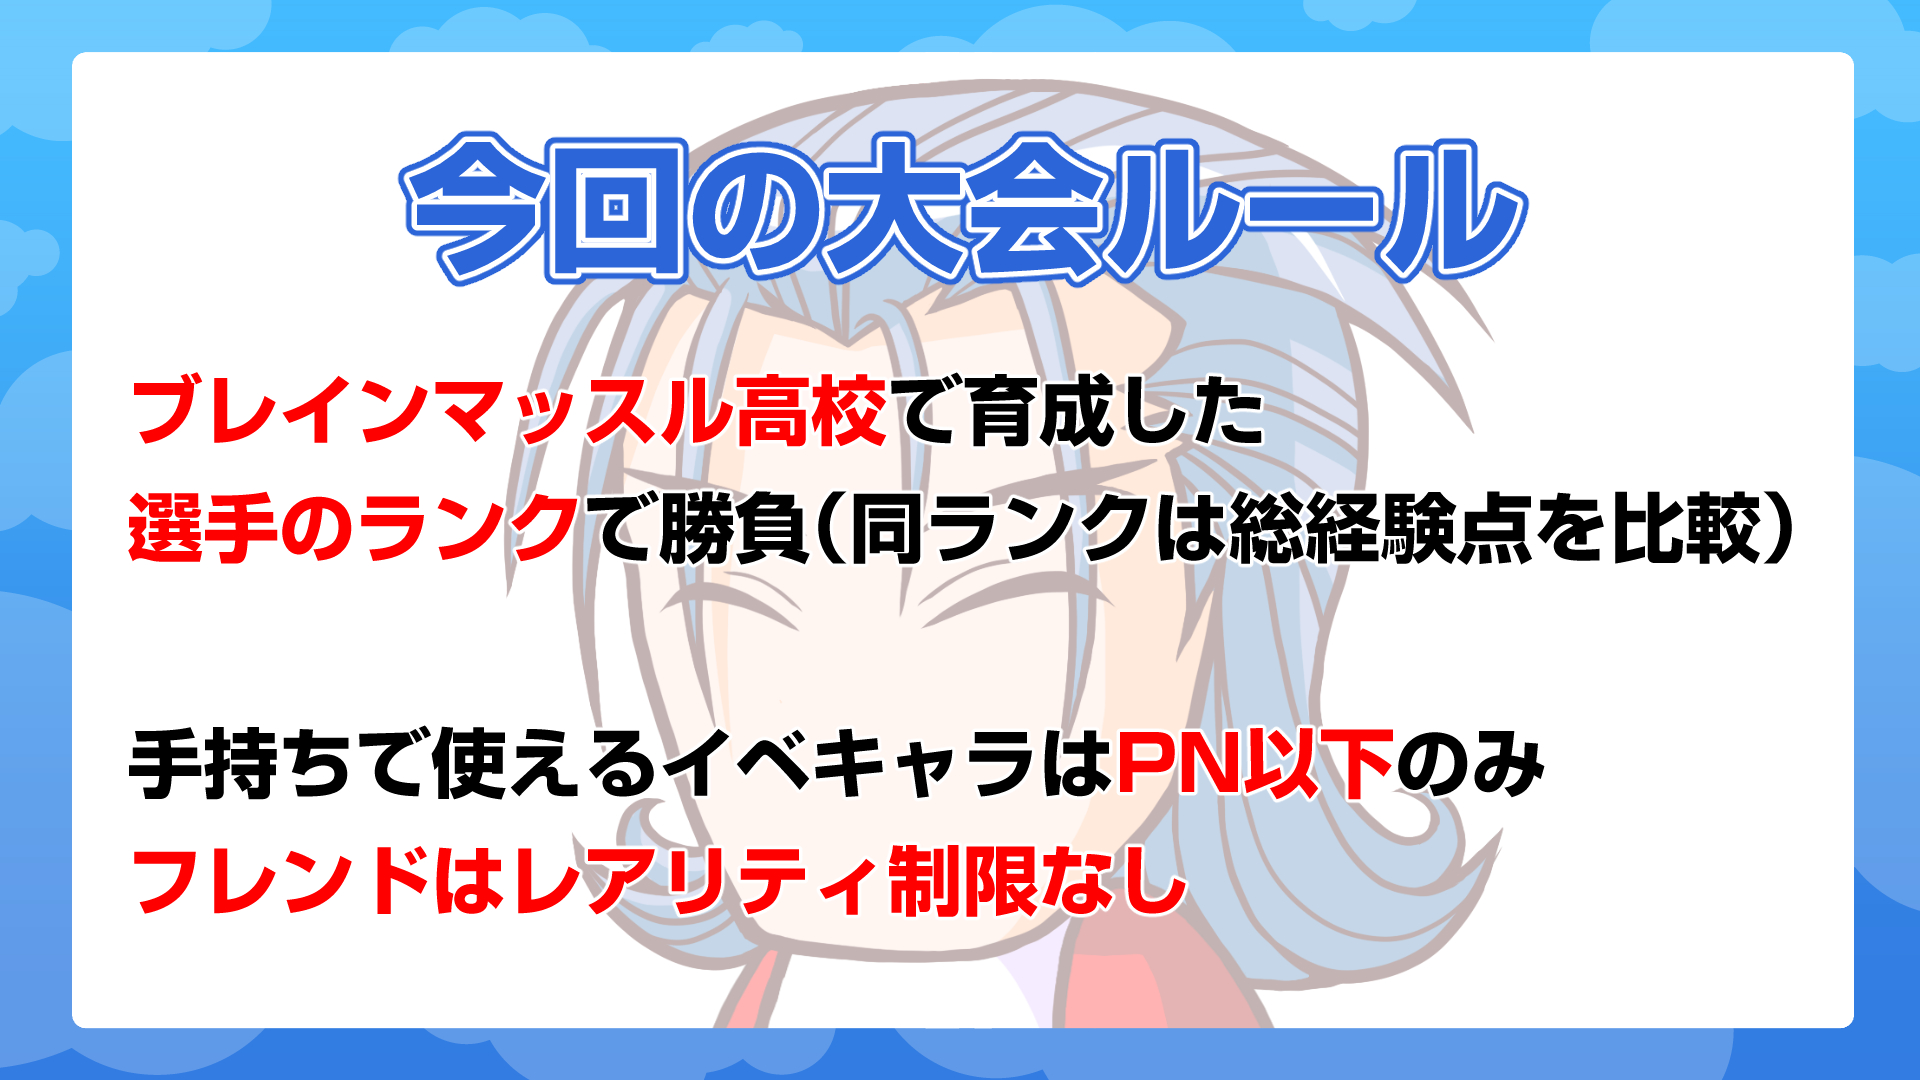 /theme/famitsu/pawapuro/images/banner/大会ルール3.jpg